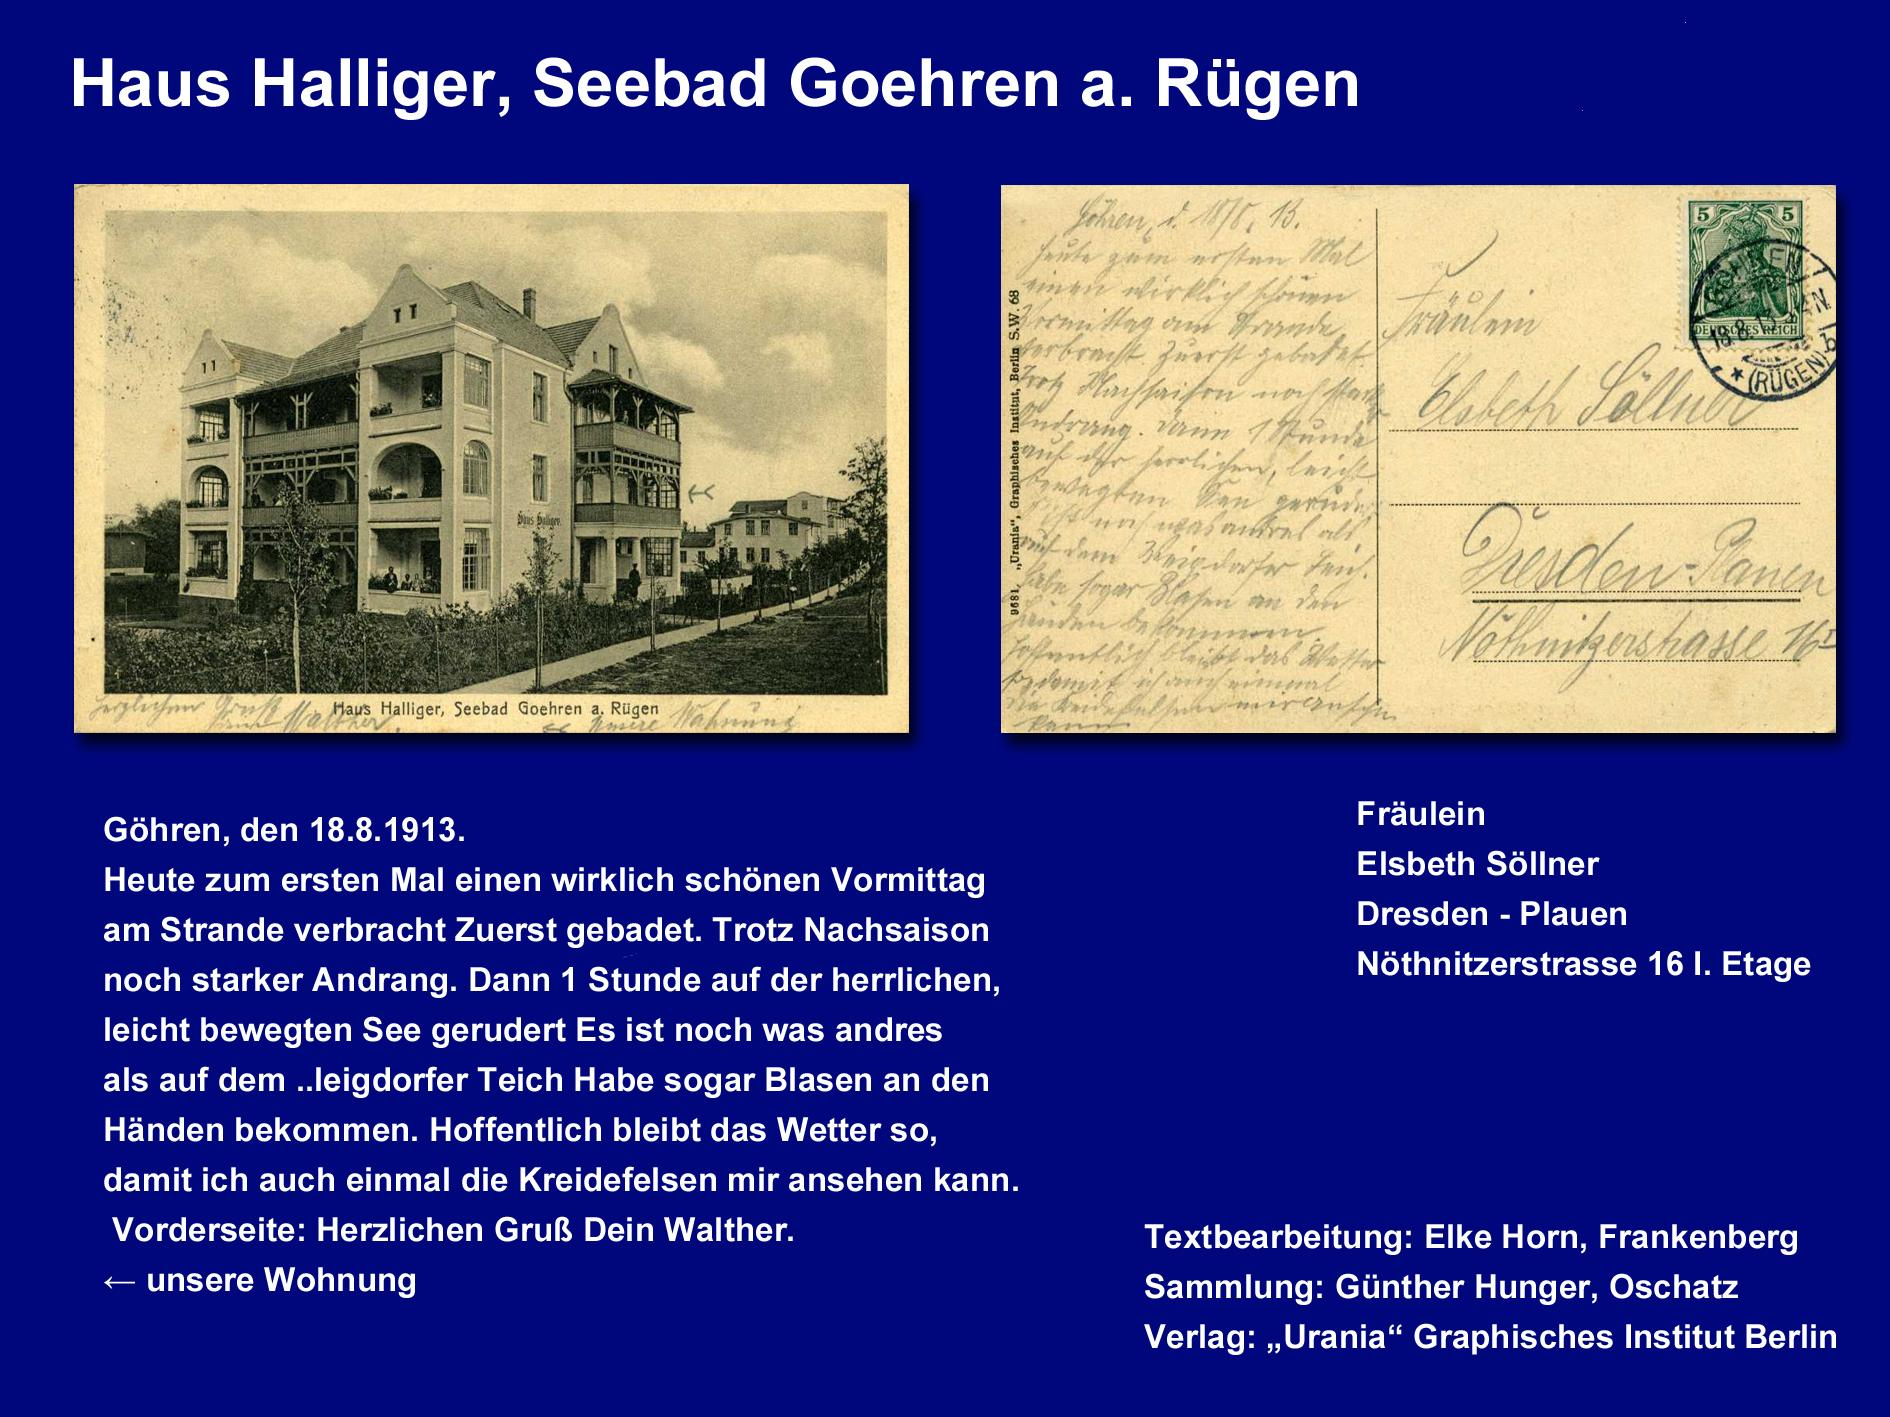 Haus Halliger, Seebad Goehren